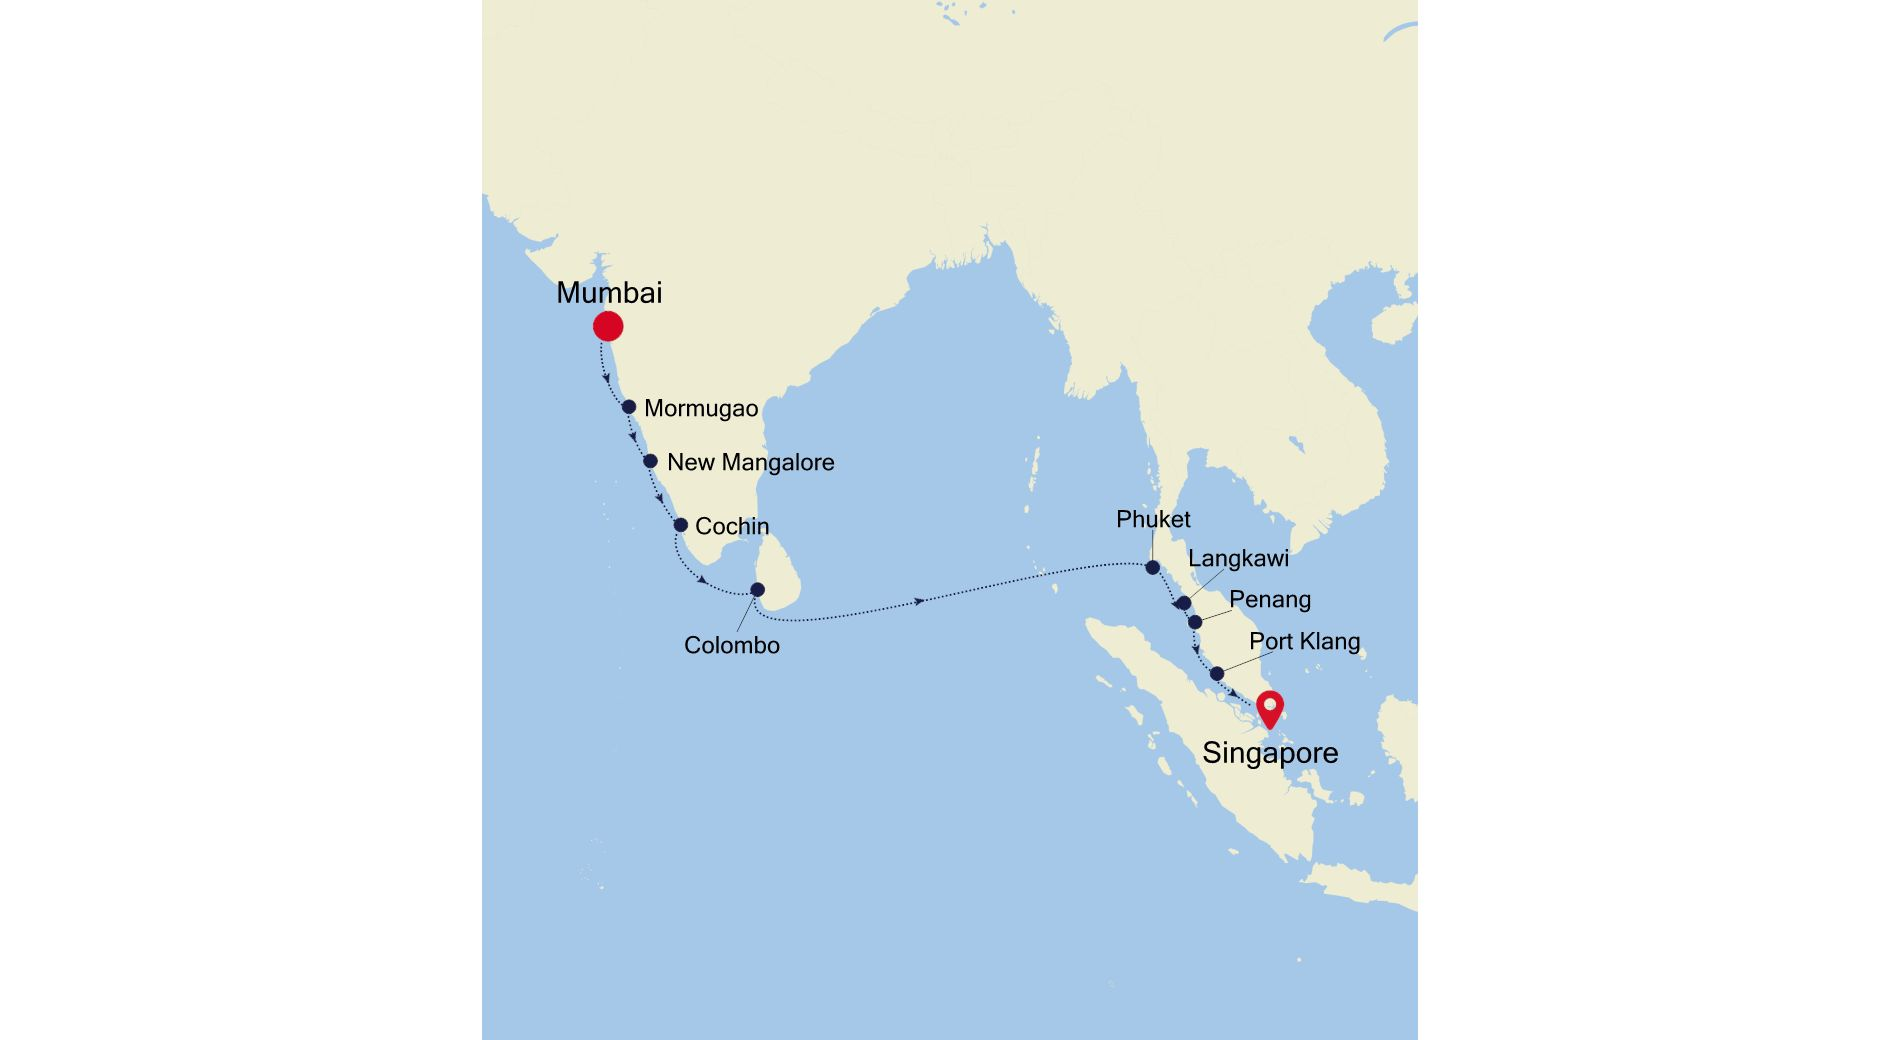 MO211126014 - Mumbai a Singapore